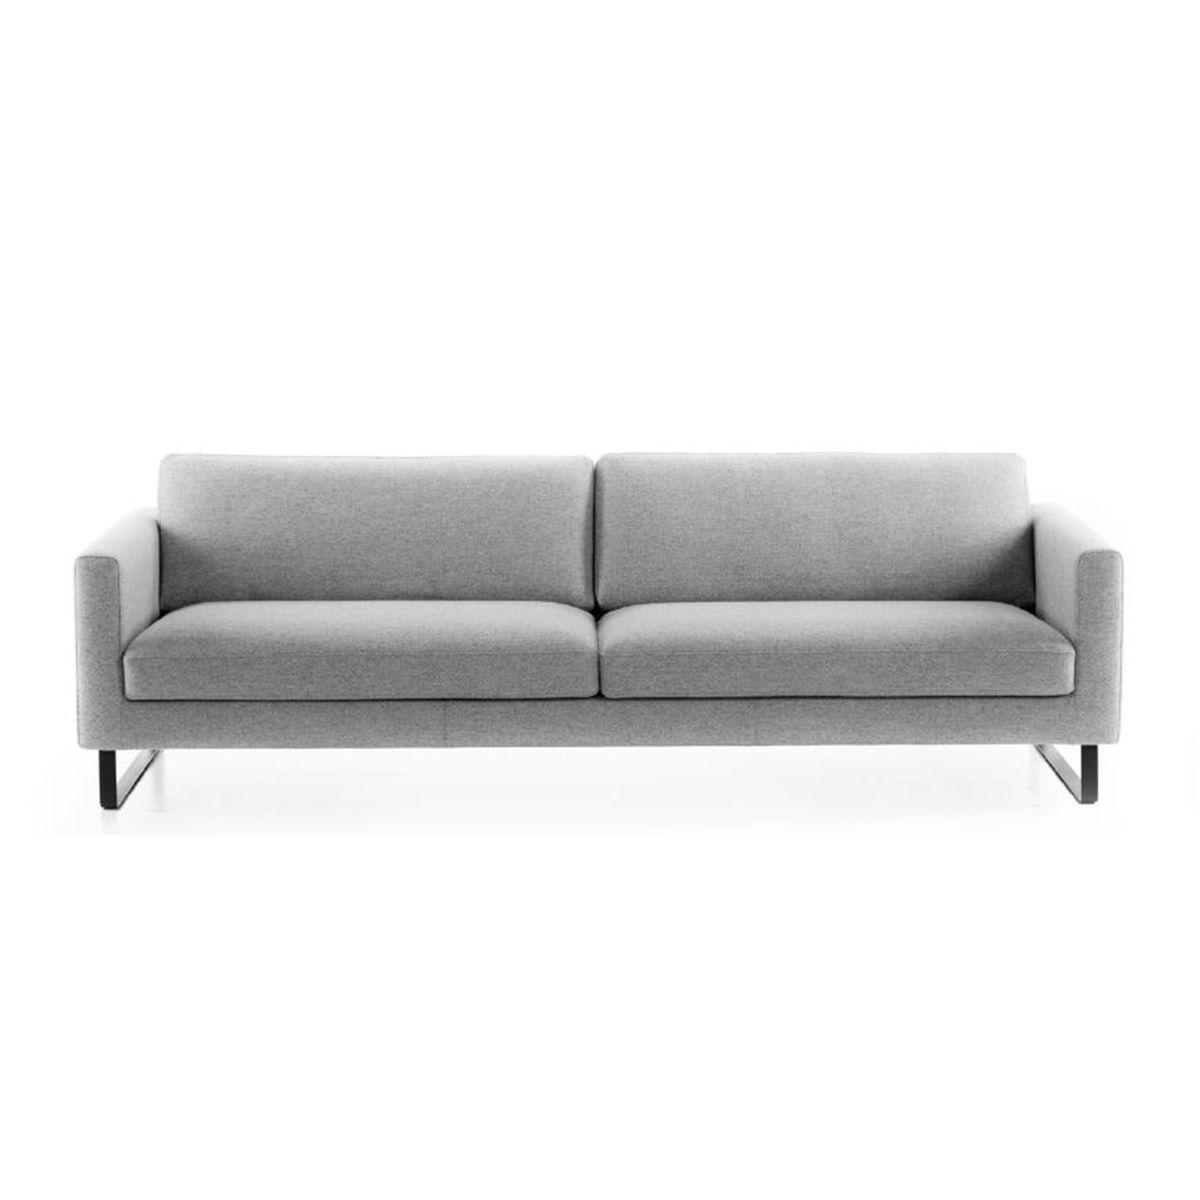 Canapé 3 places design Elegance PROSTORIA Zendart Design